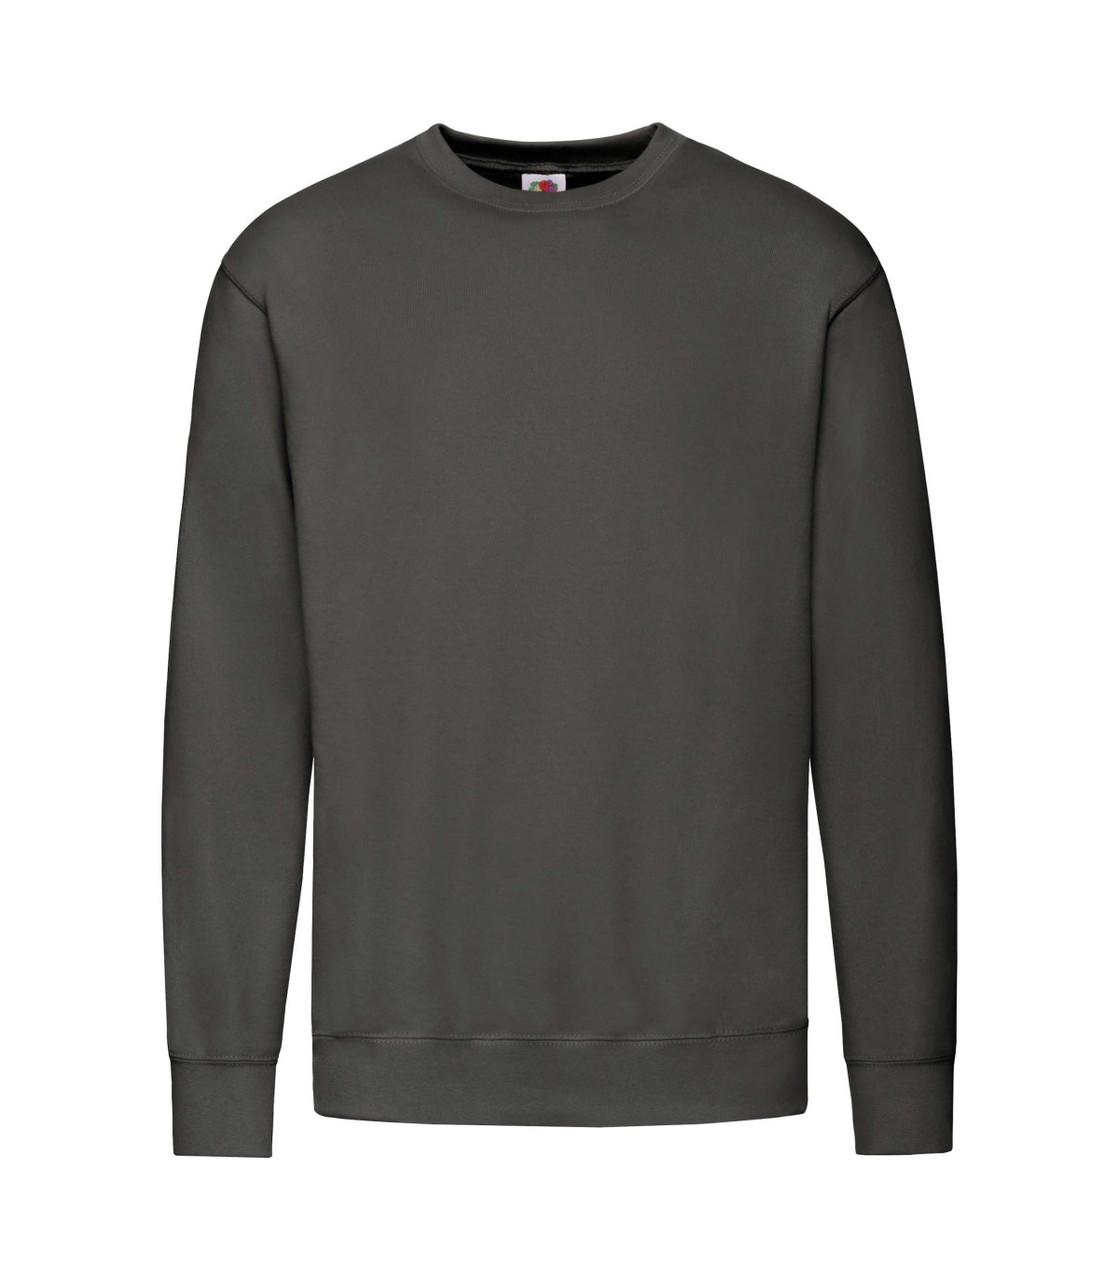 Мужской свитшот легкий темно-серый 156-GL